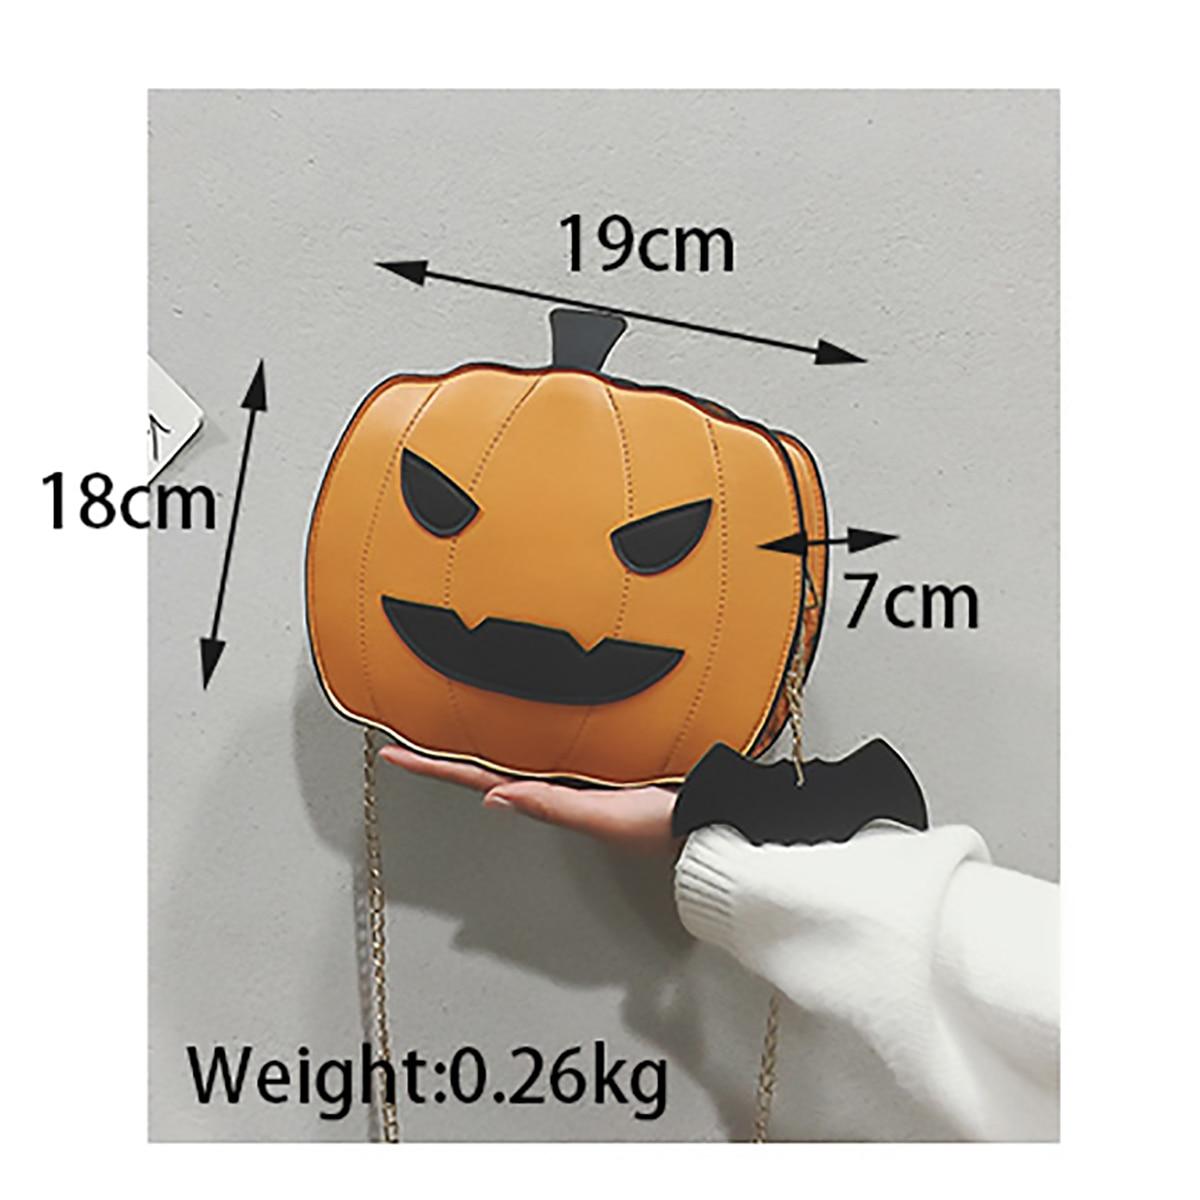 Shoulder Bag Pumpkin Bag For Women Pu Leather Creativity Easter Halloween Lamp Handbags New Designed  Cross Body Bags Gift 2